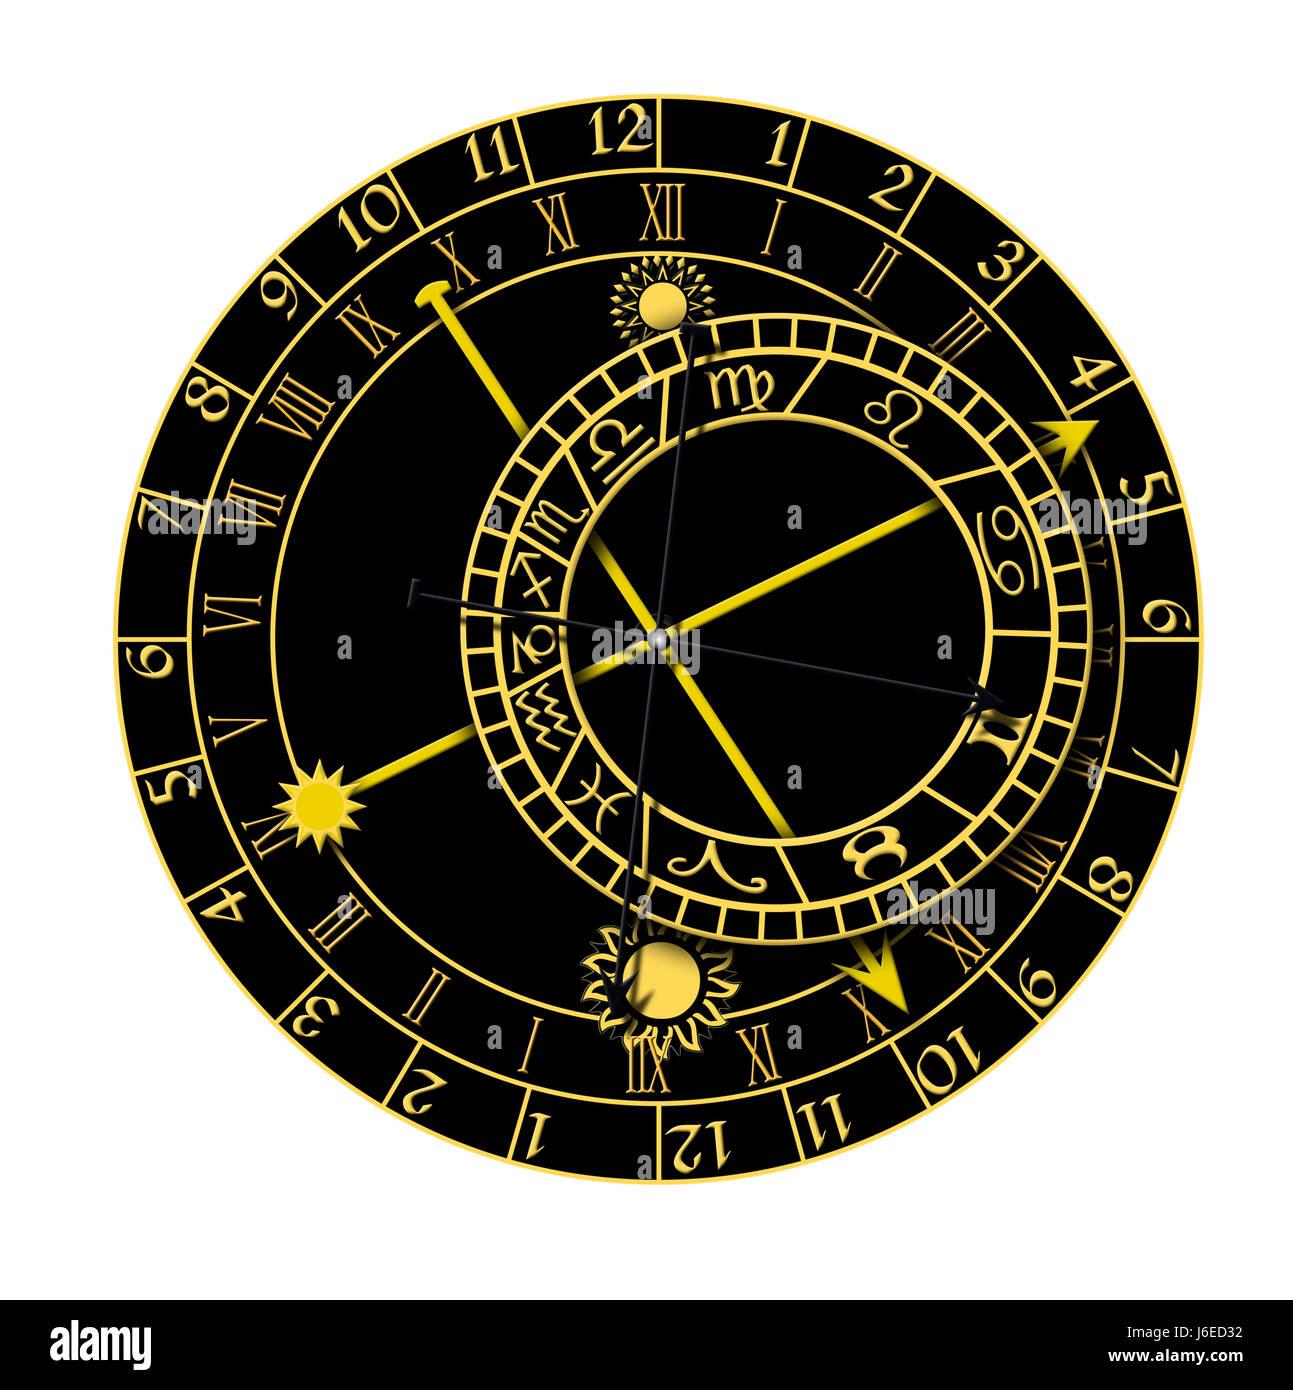 Astrologie singles Dating